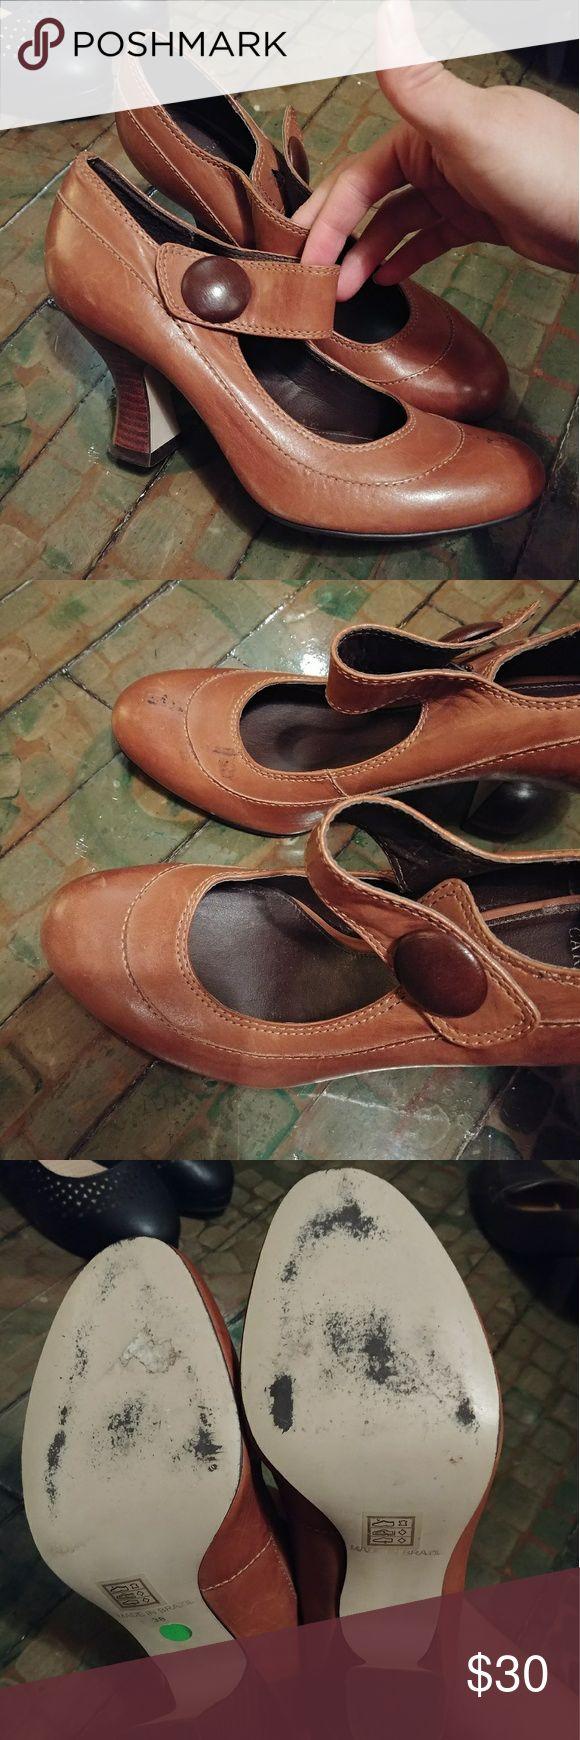 Carvela kitty vintage heels Size 38 looks like leather..not sure. Some marks on right shoe carvela Shoes Heels